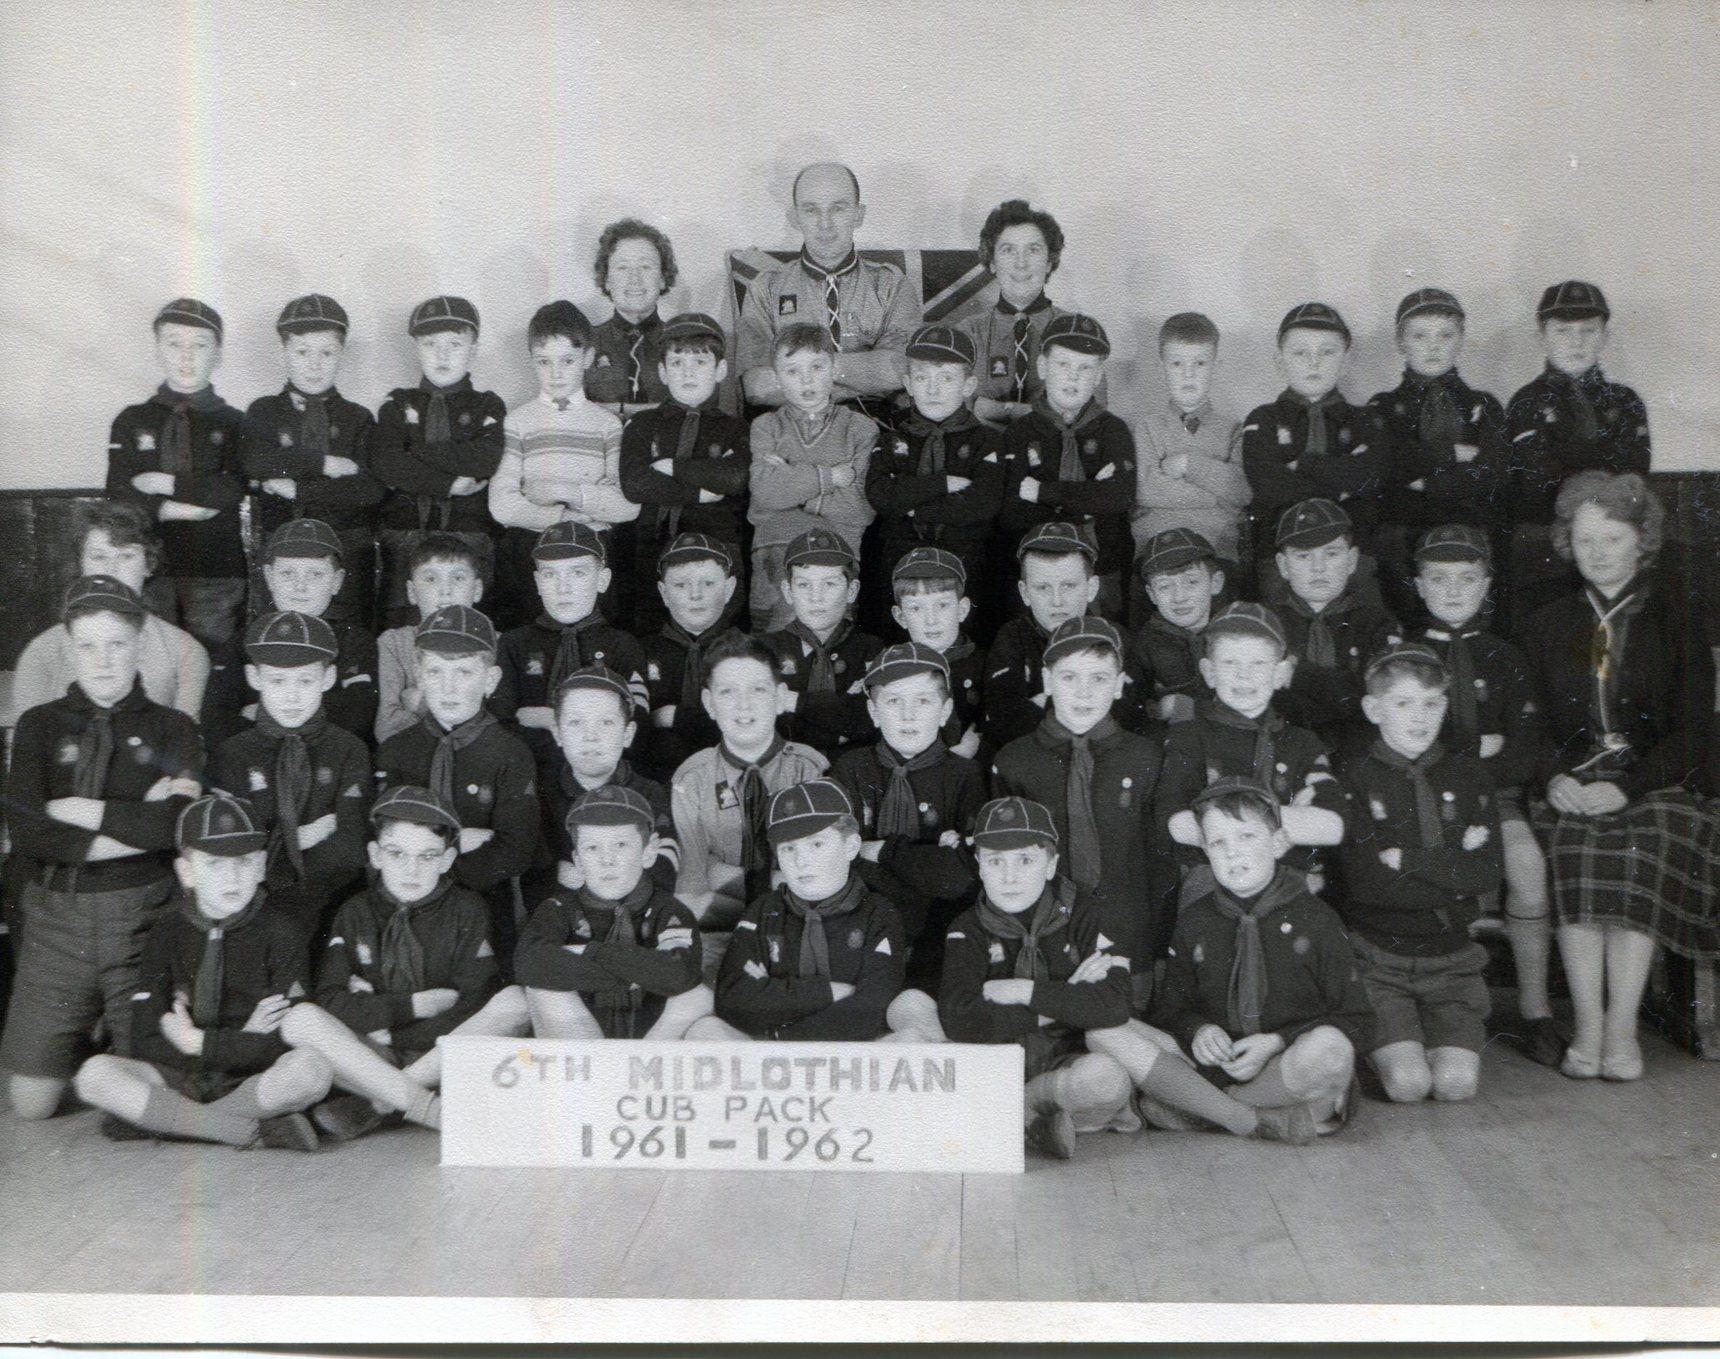 The 6th Midlothian Cub Pack 1961 - 1962